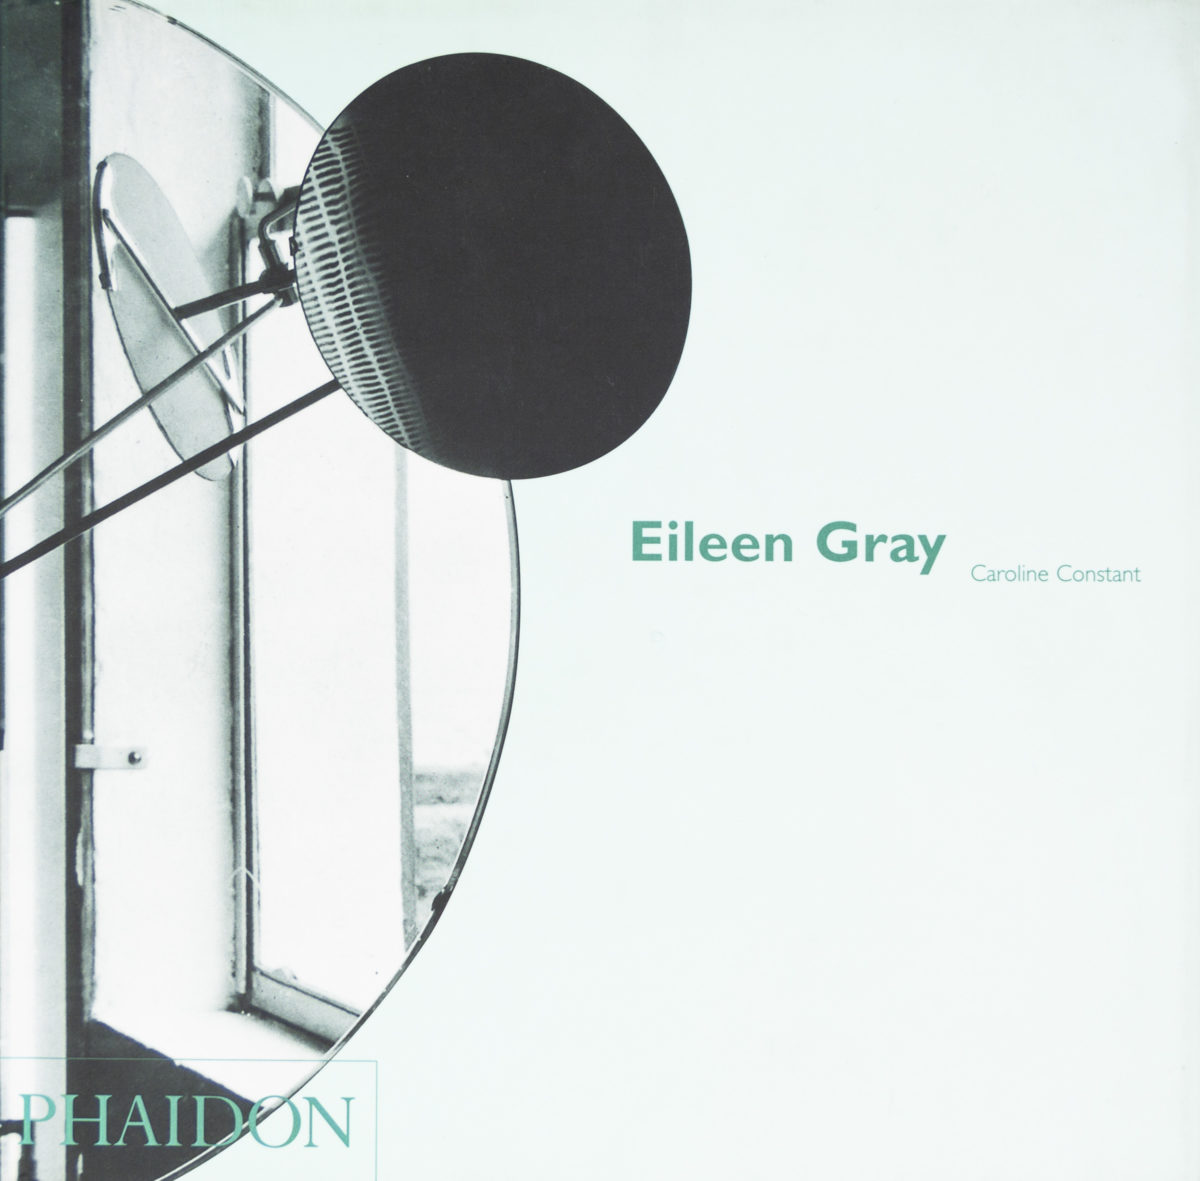 , Eileen Gray